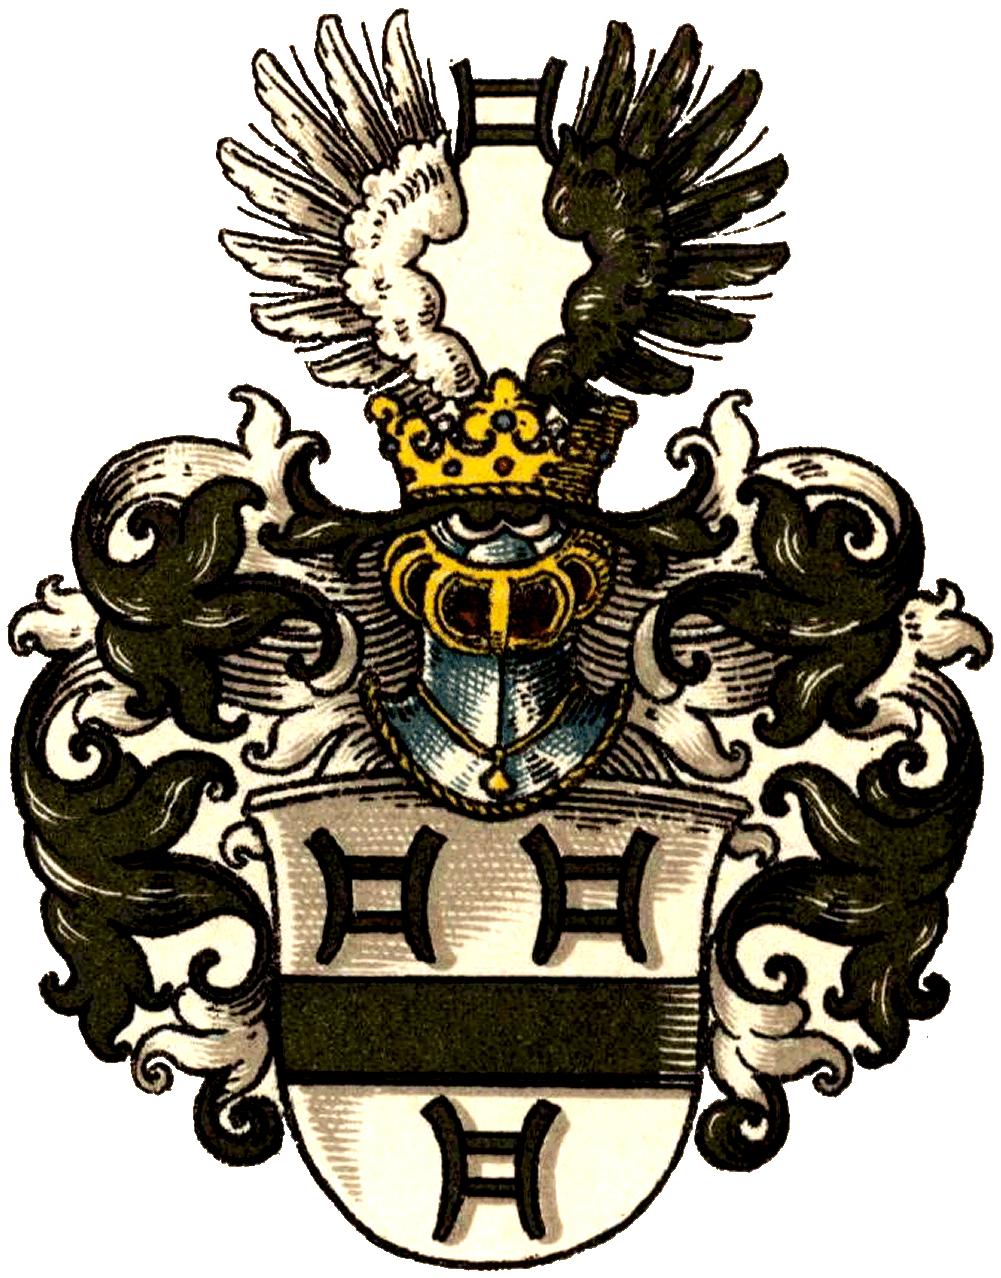 Enkelt gratis Østerrike